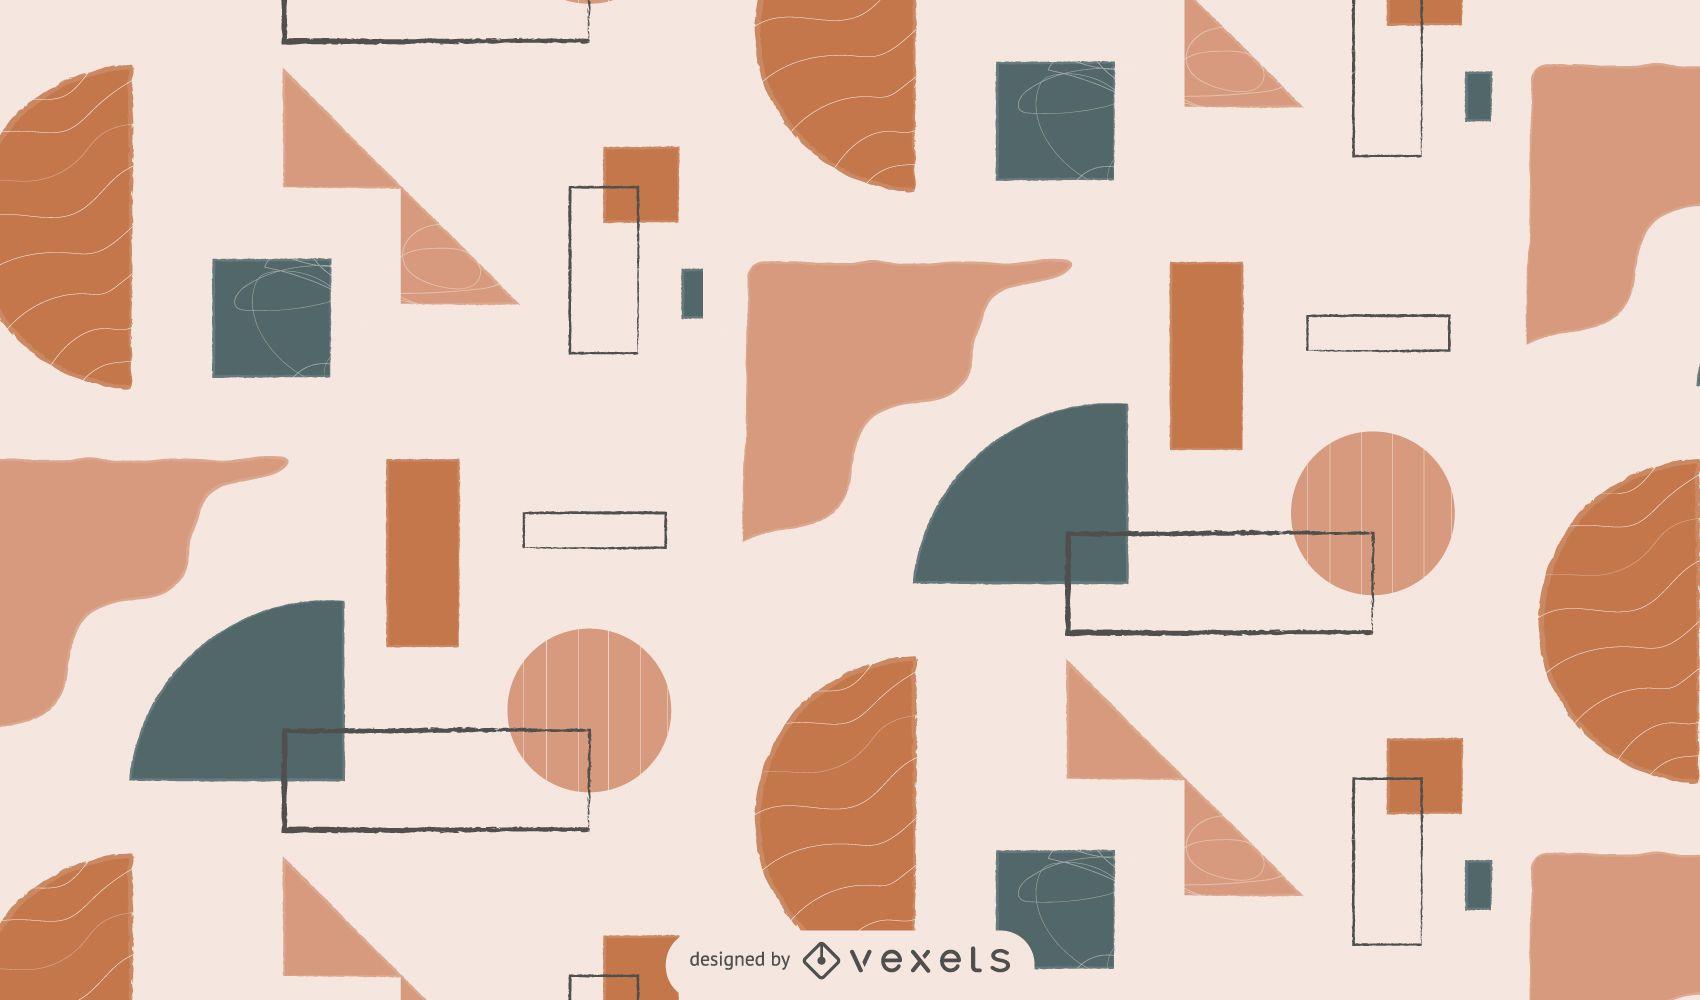 Abstract geometric patten design